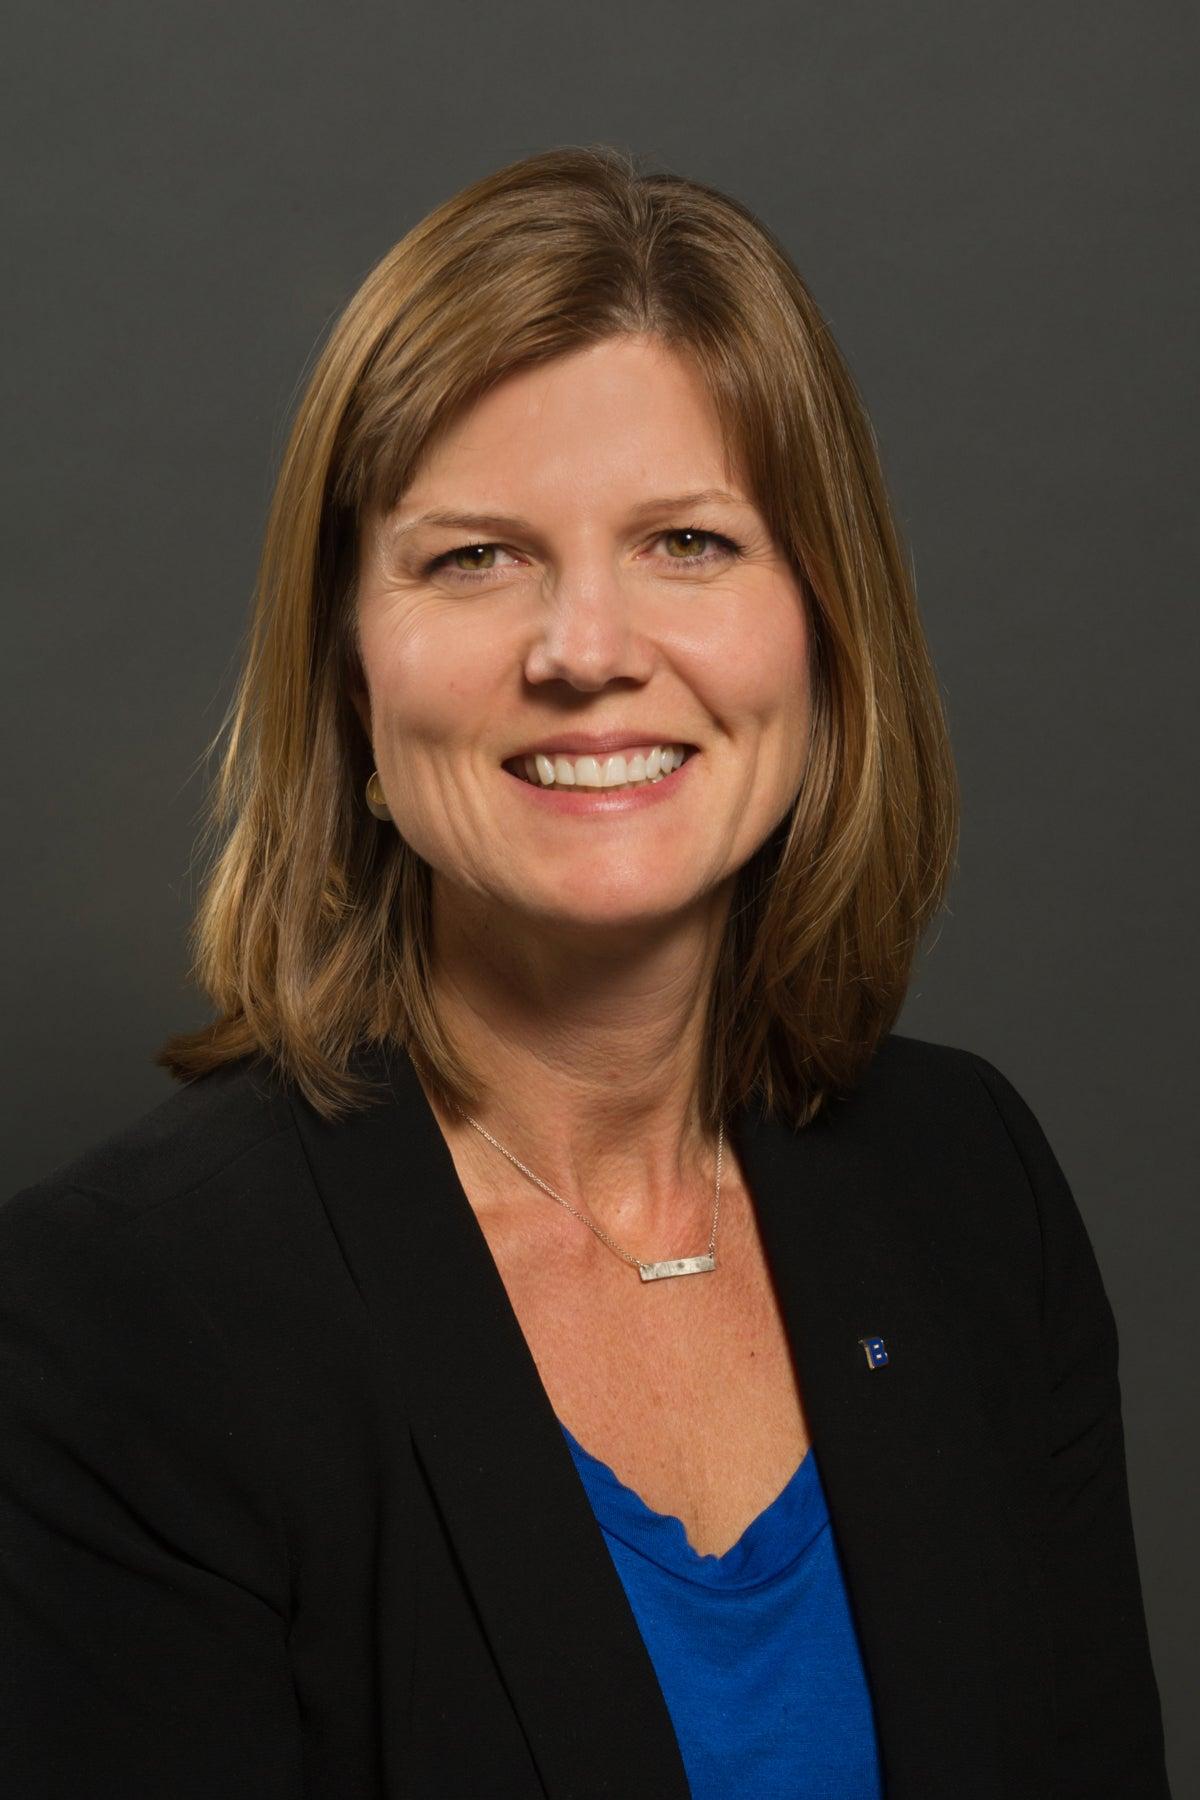 Tamara Thompson, Alumni Association Board of Directors, Photo by Allison Corona